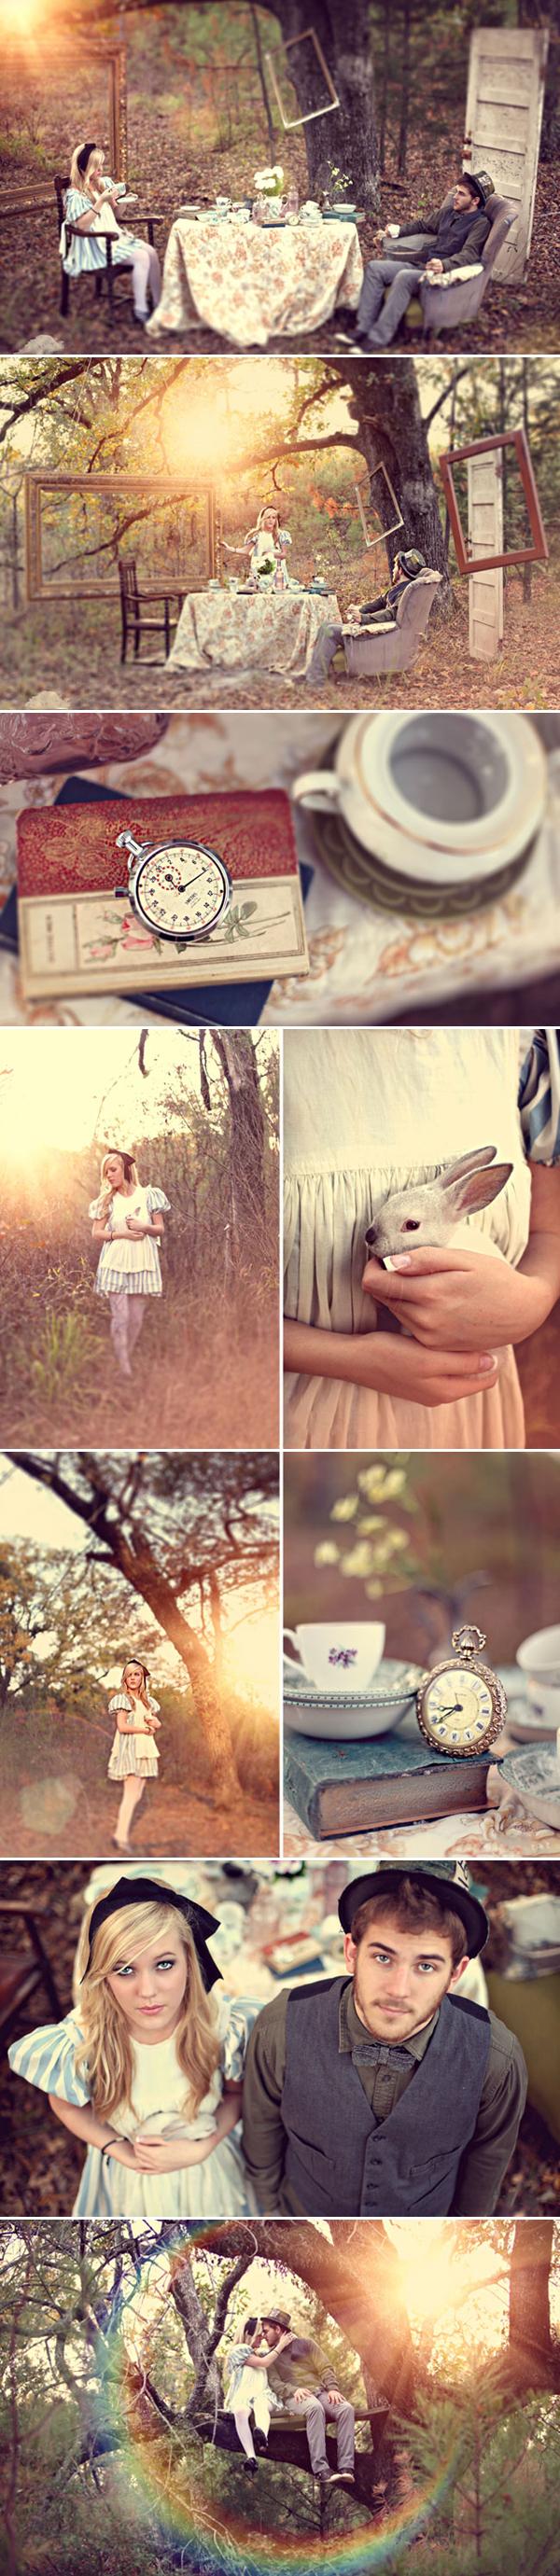 Alice in Wonderland engagement photo